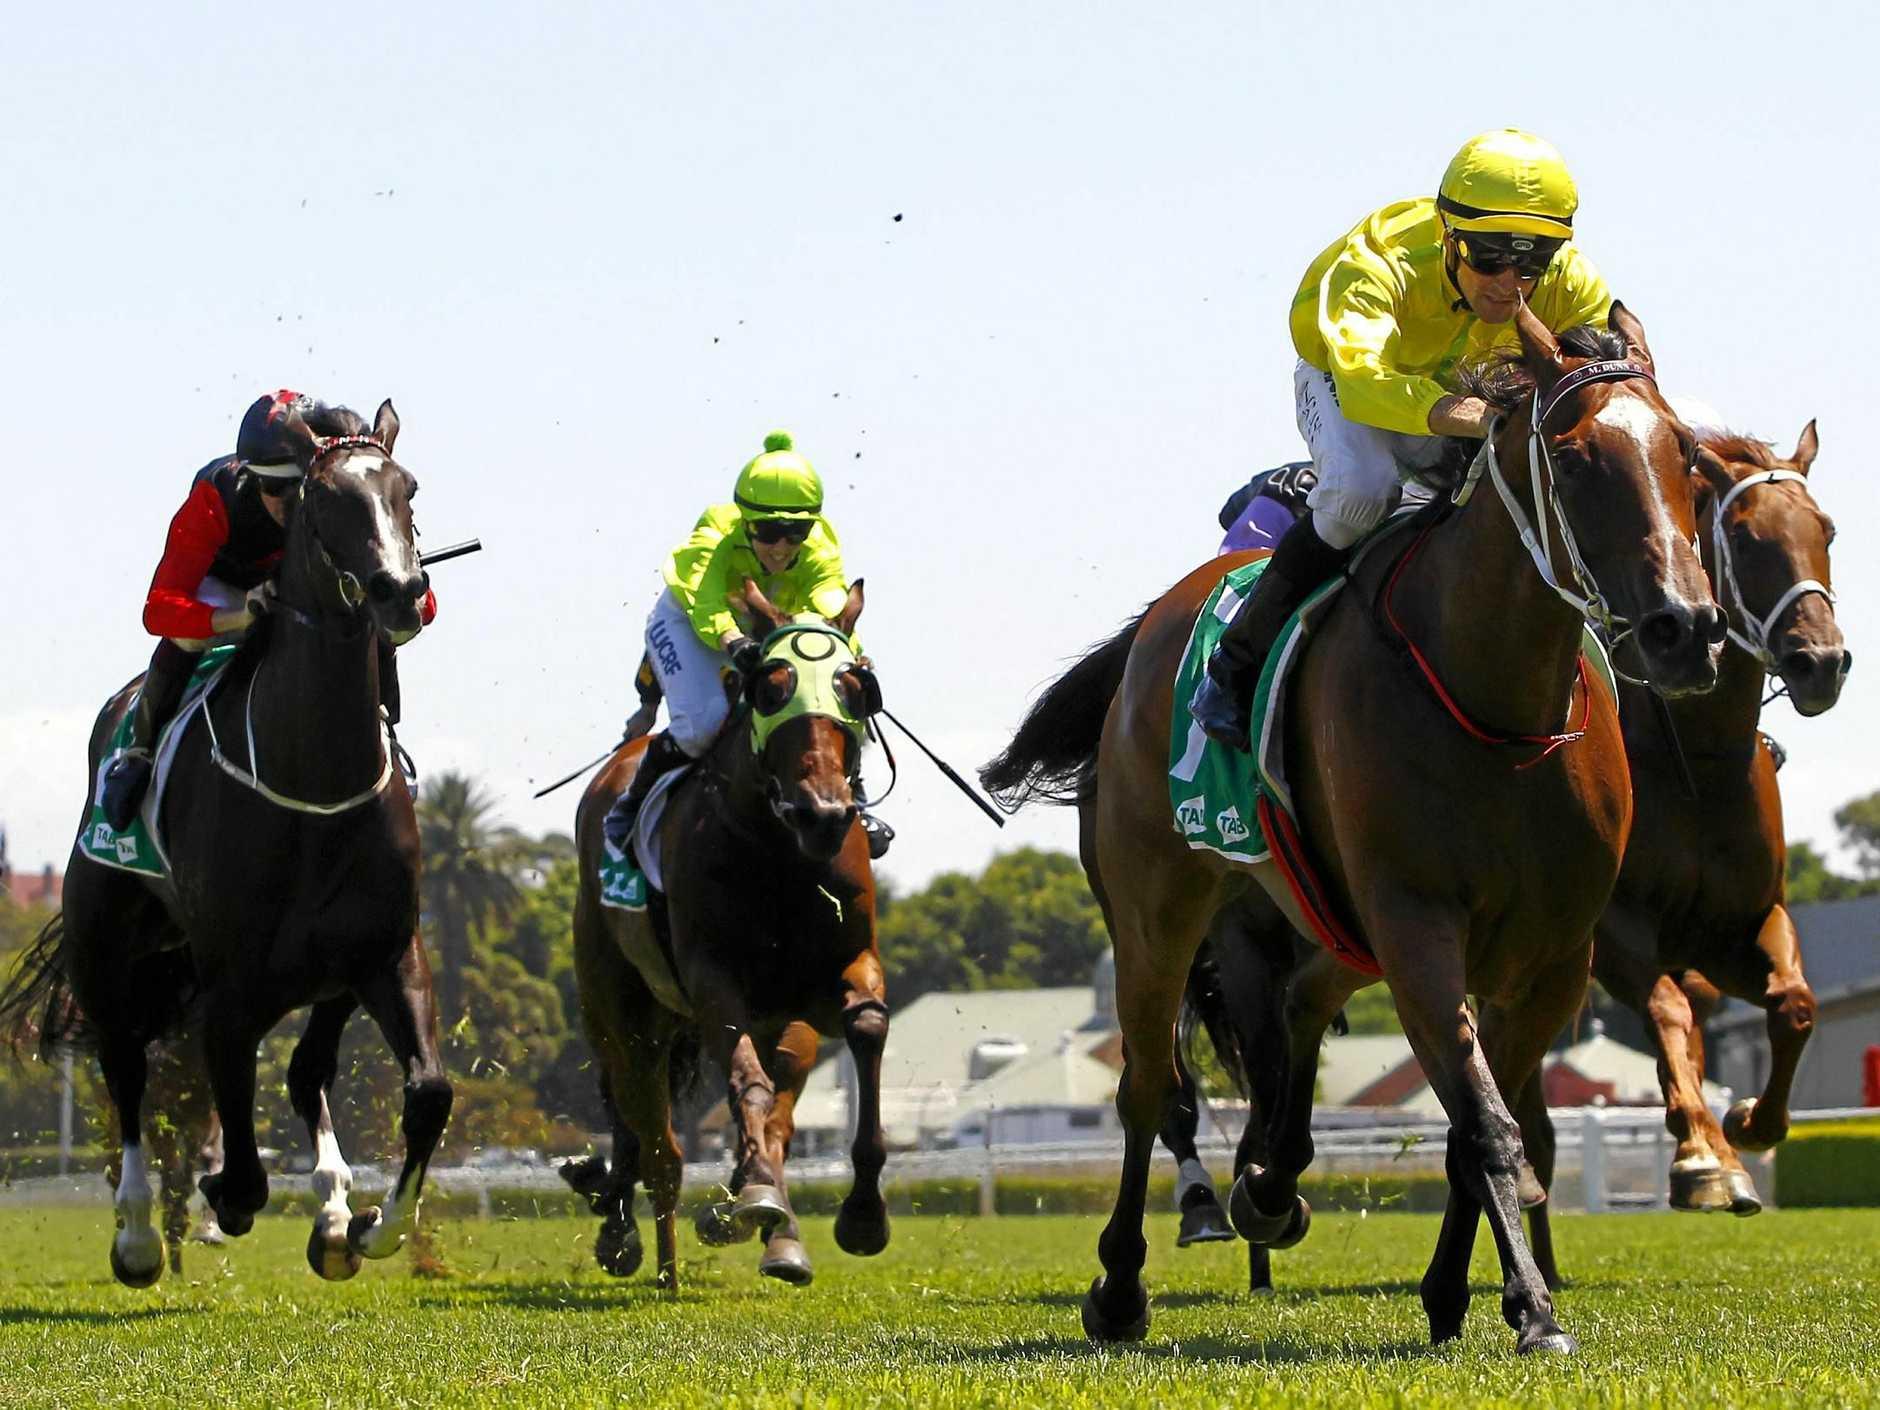 Jockey Tye Angland (right) rides Runway Ready to win the Tab Highway Handicap, during Royal Randwick Race Day at Royal Randwick in Sydney.